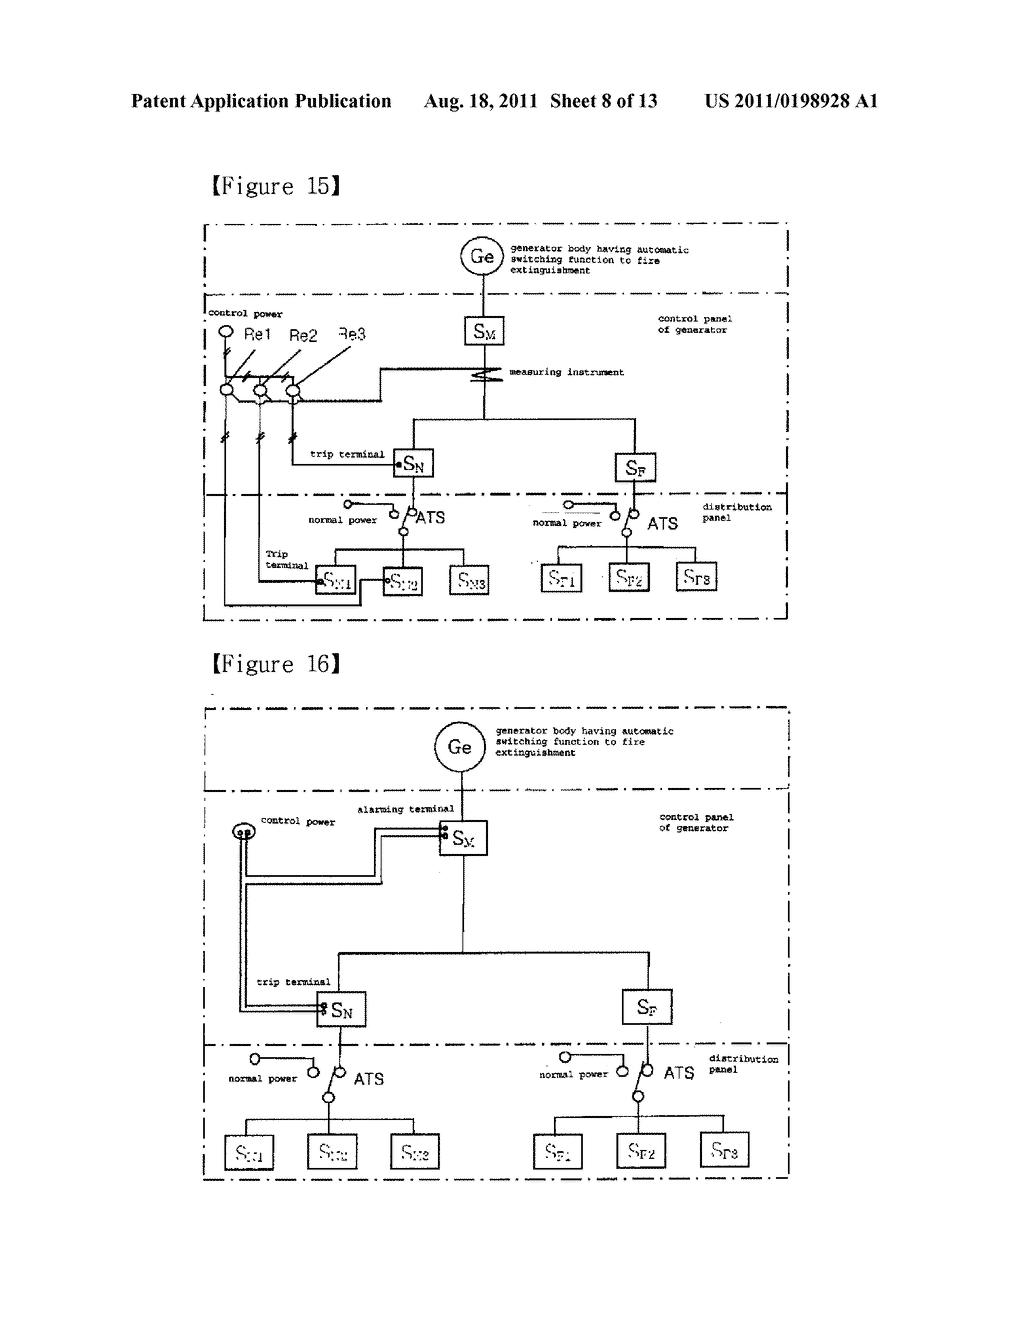 Wiring Diagram Emergency Generator : Emergency generator diagram library of wiring